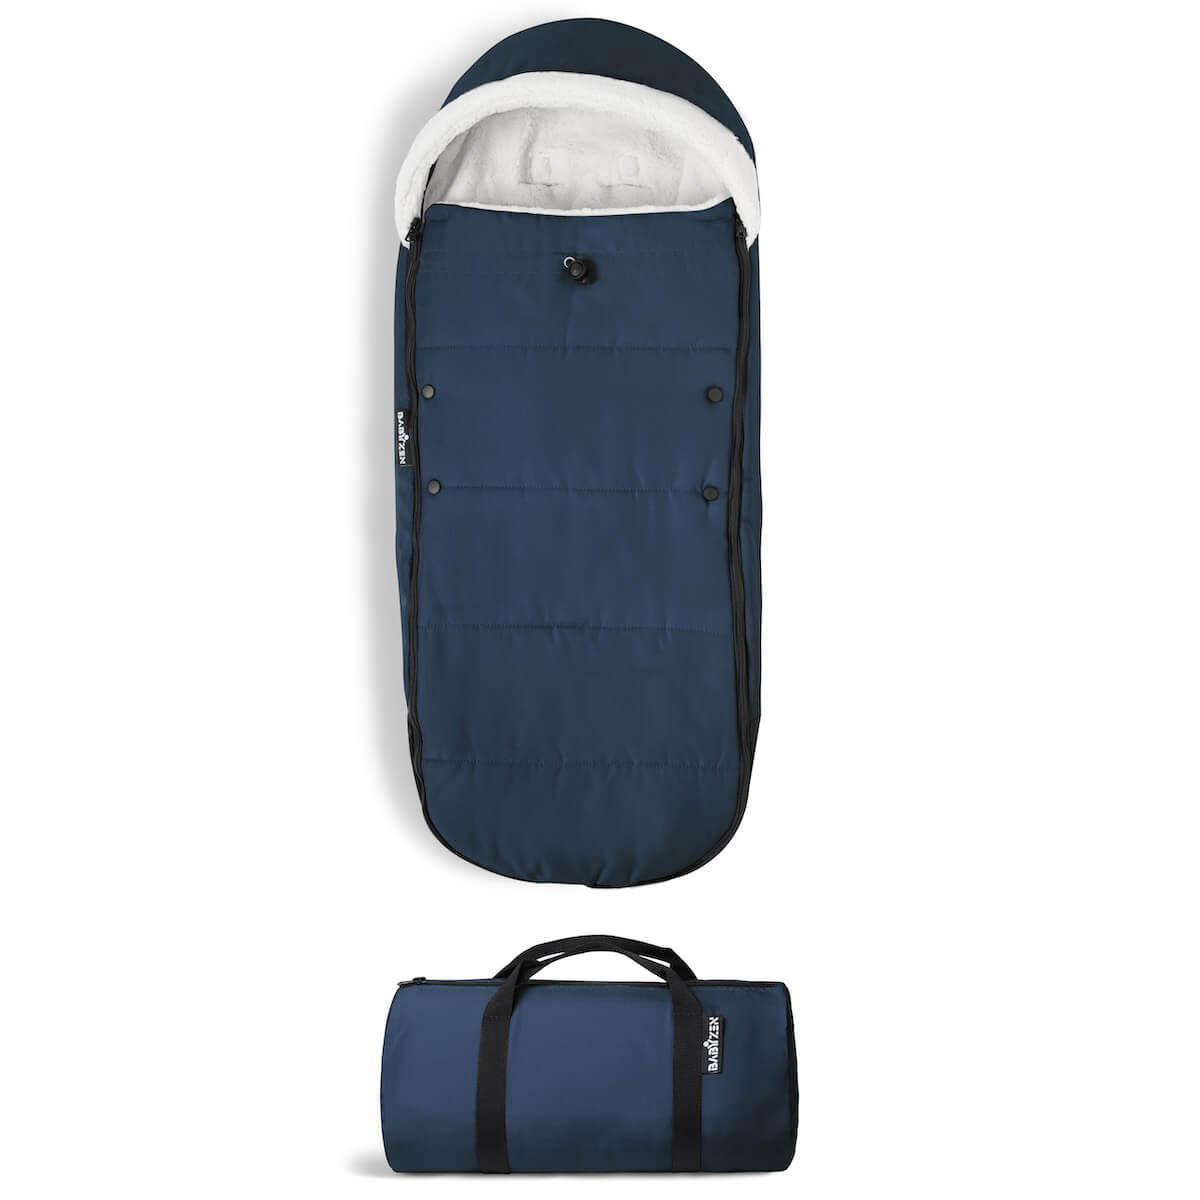 YOYO saco BABYZEN azul Air France